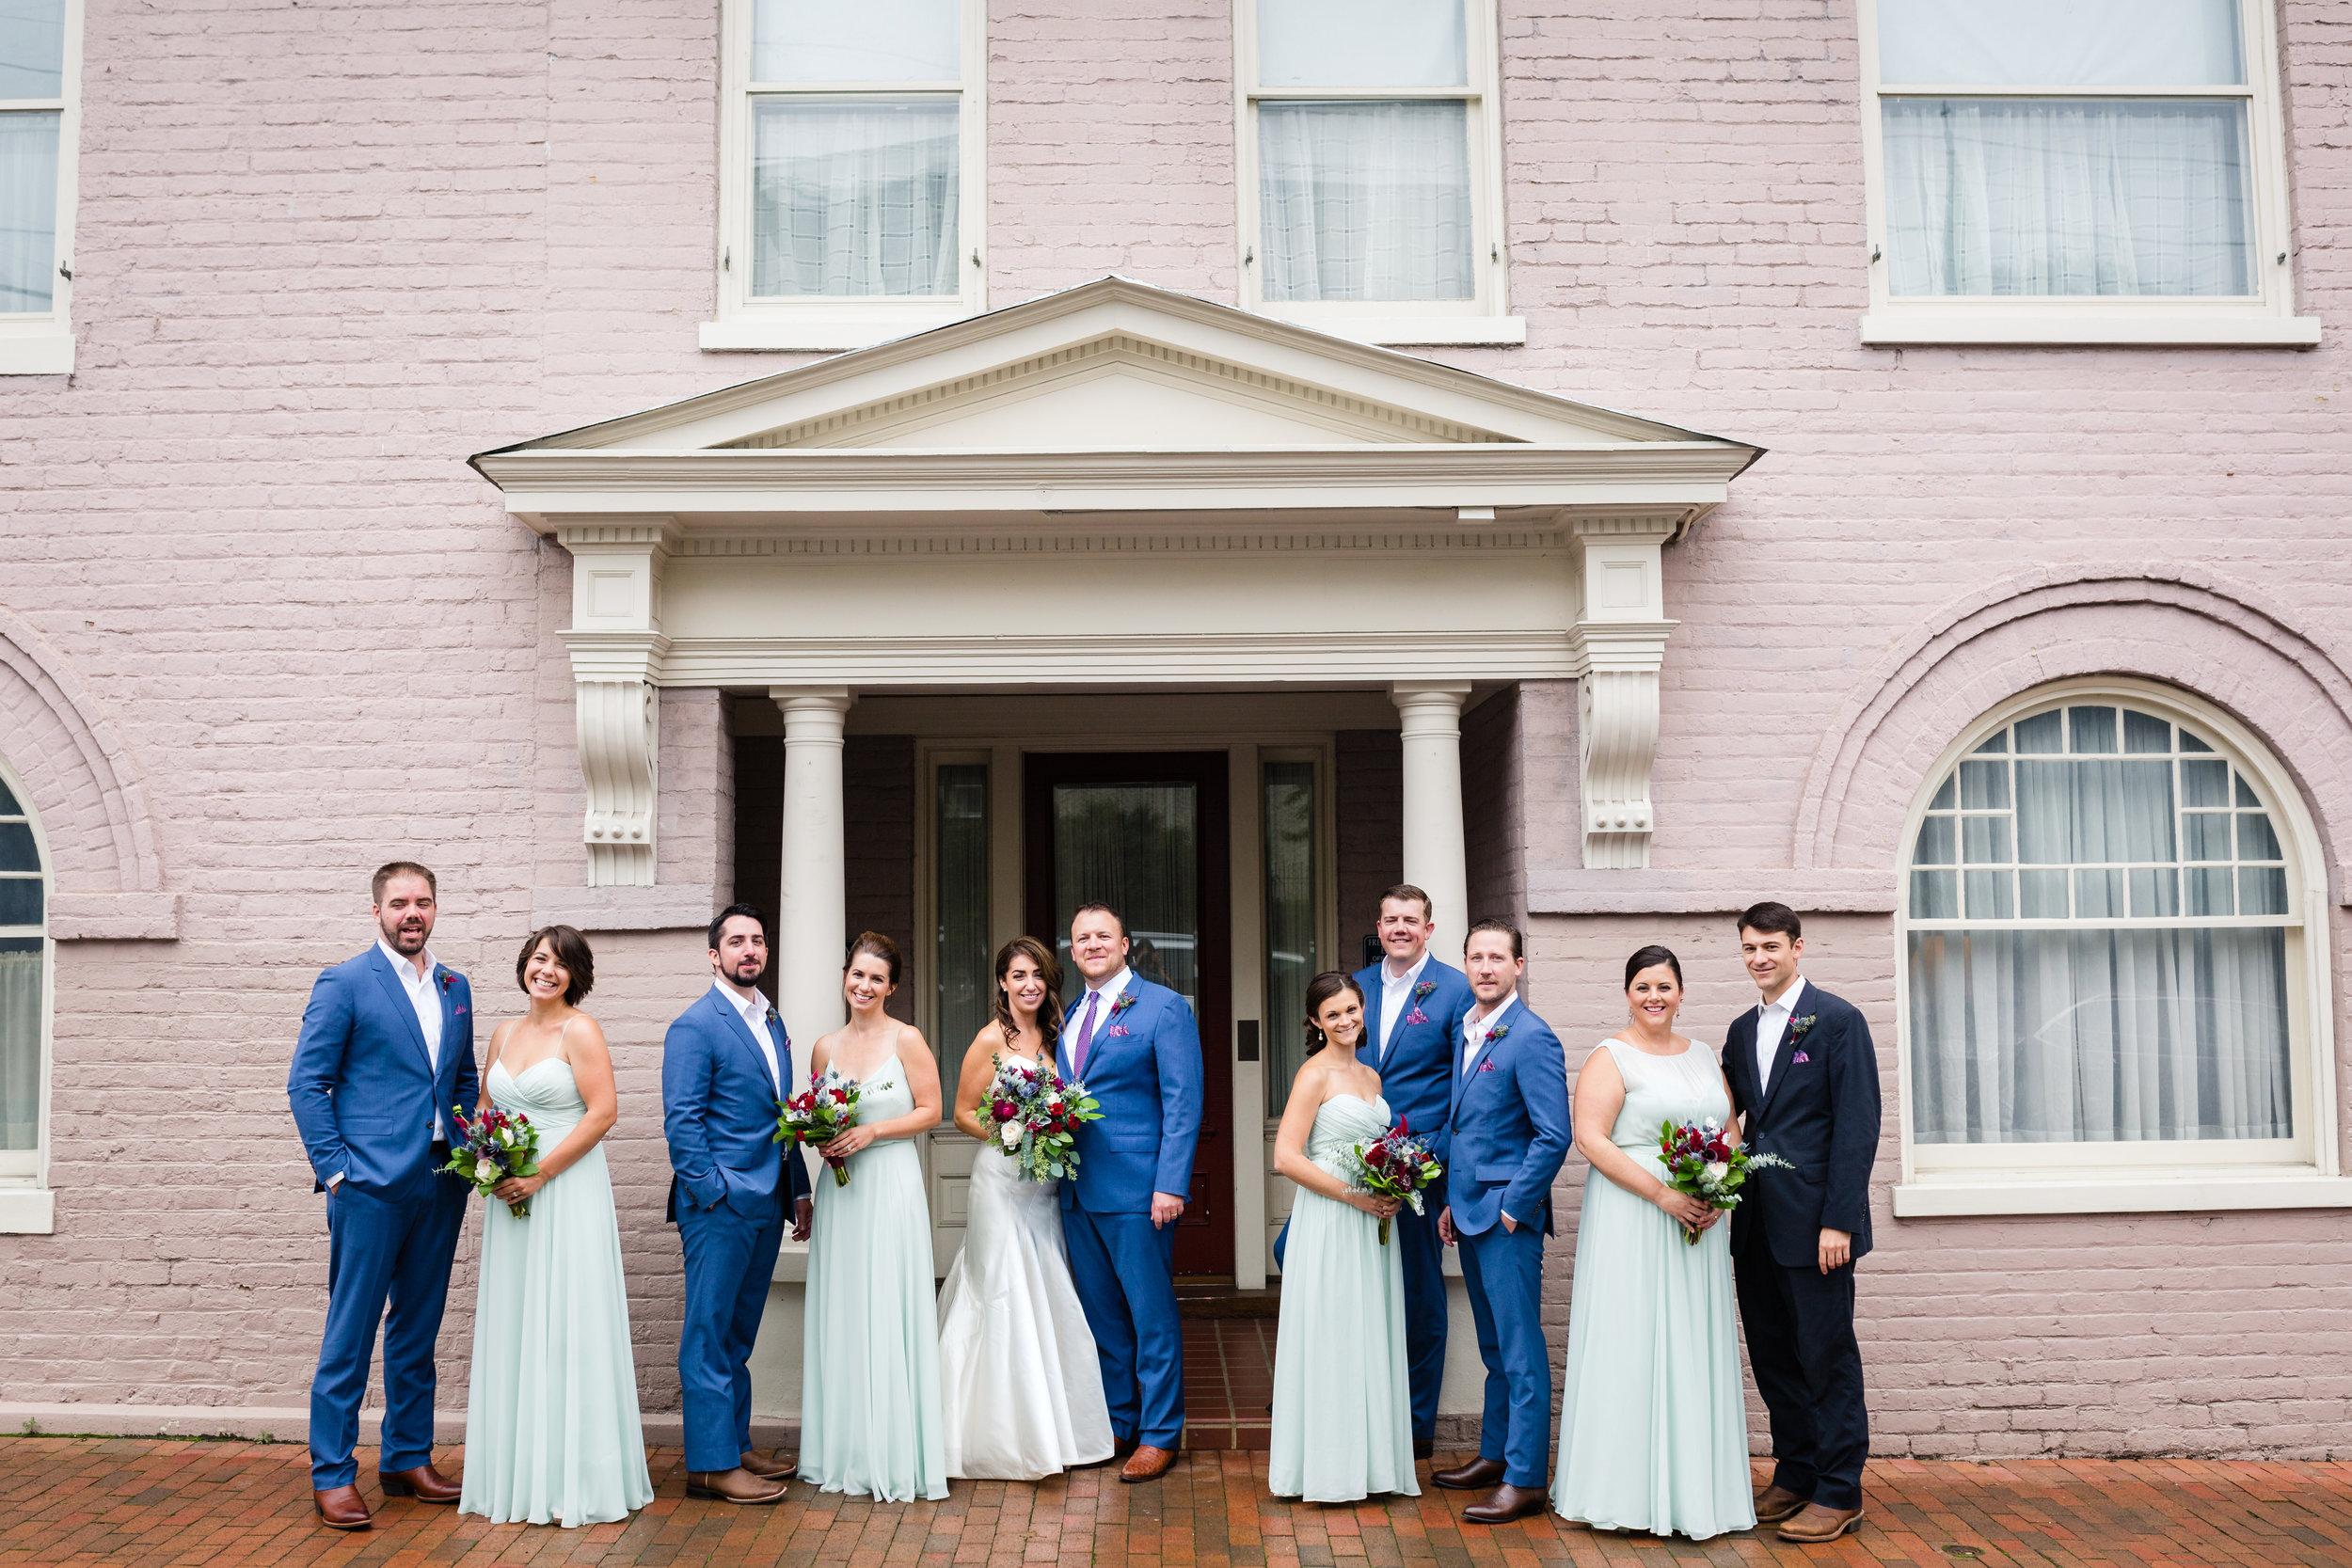 j r wedding blog-78.jpg